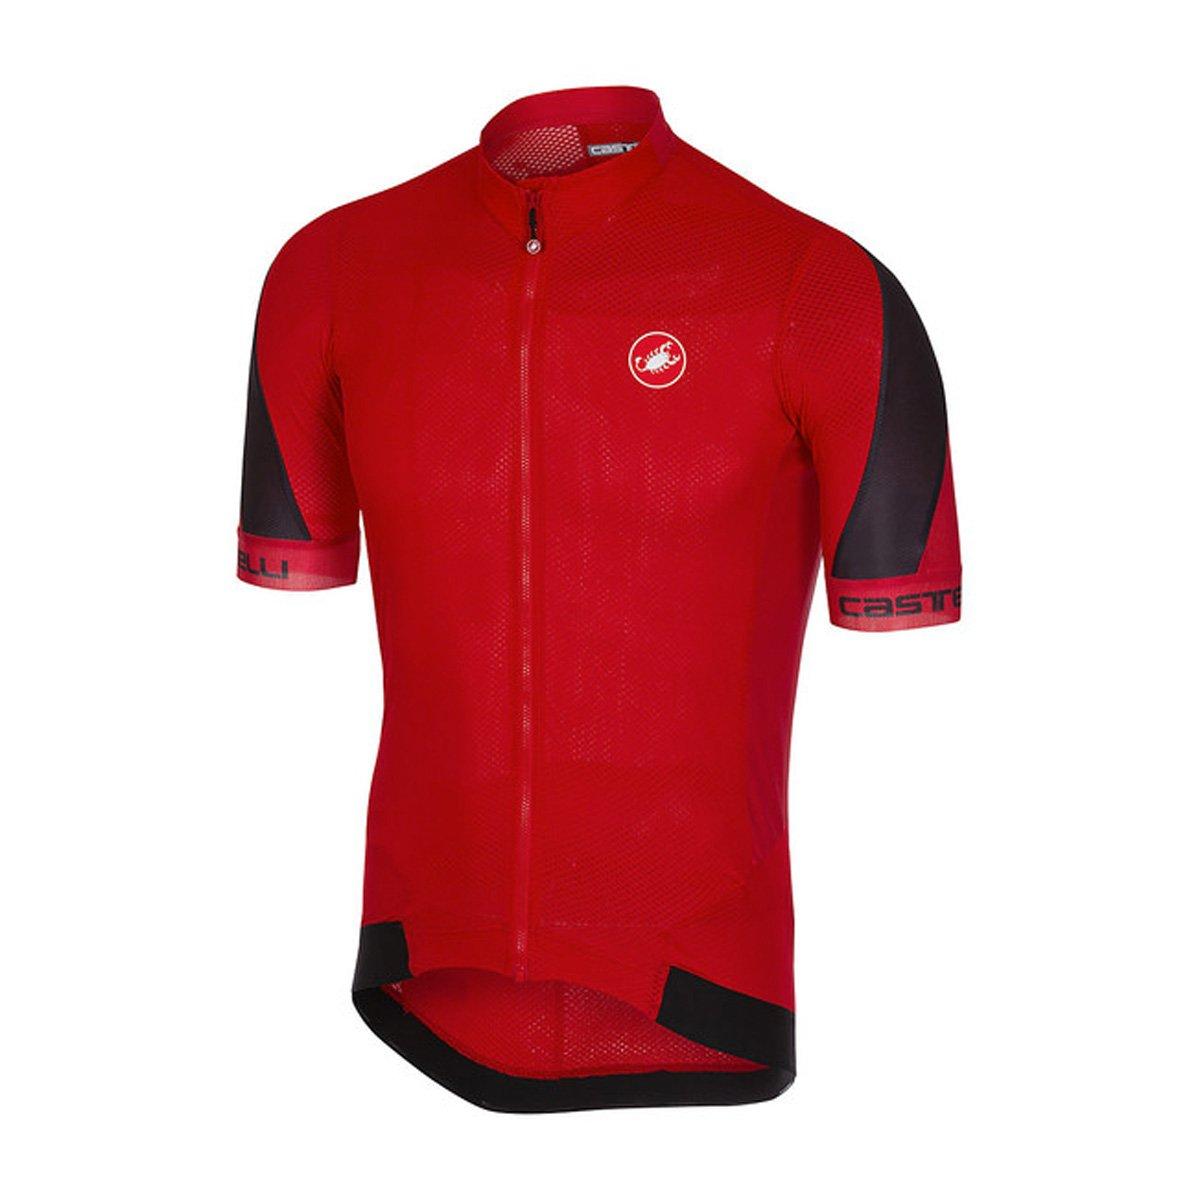 CastelliメンズVolata 2 Bike jersey fz B079Q2QKZN Medium|レッド/ブラック レッド/ブラック Medium